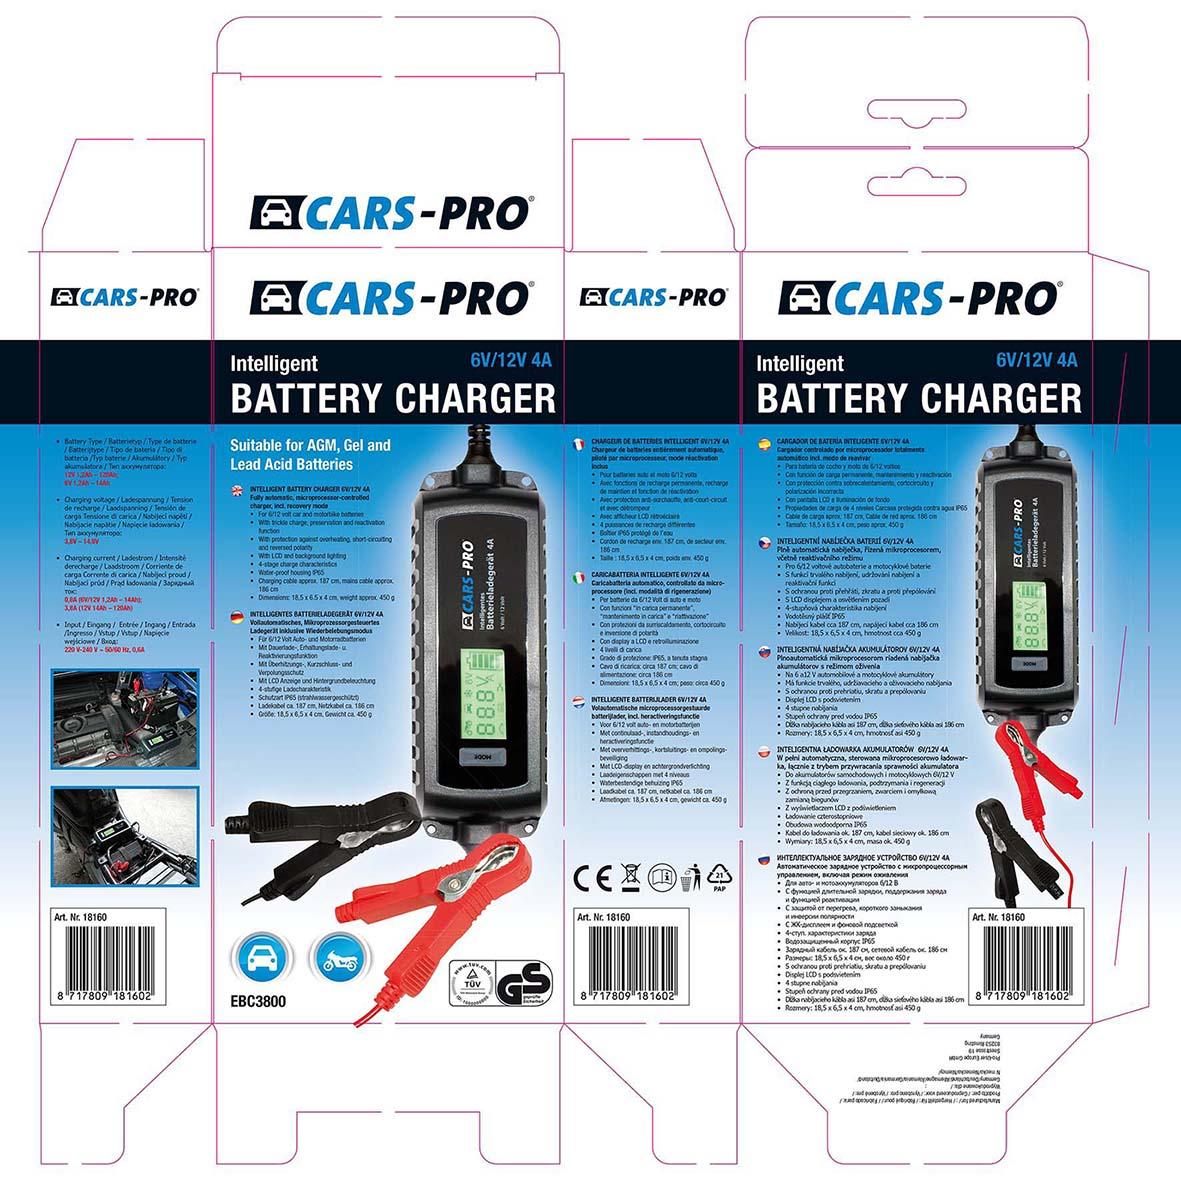 CARS-PRO verpakking